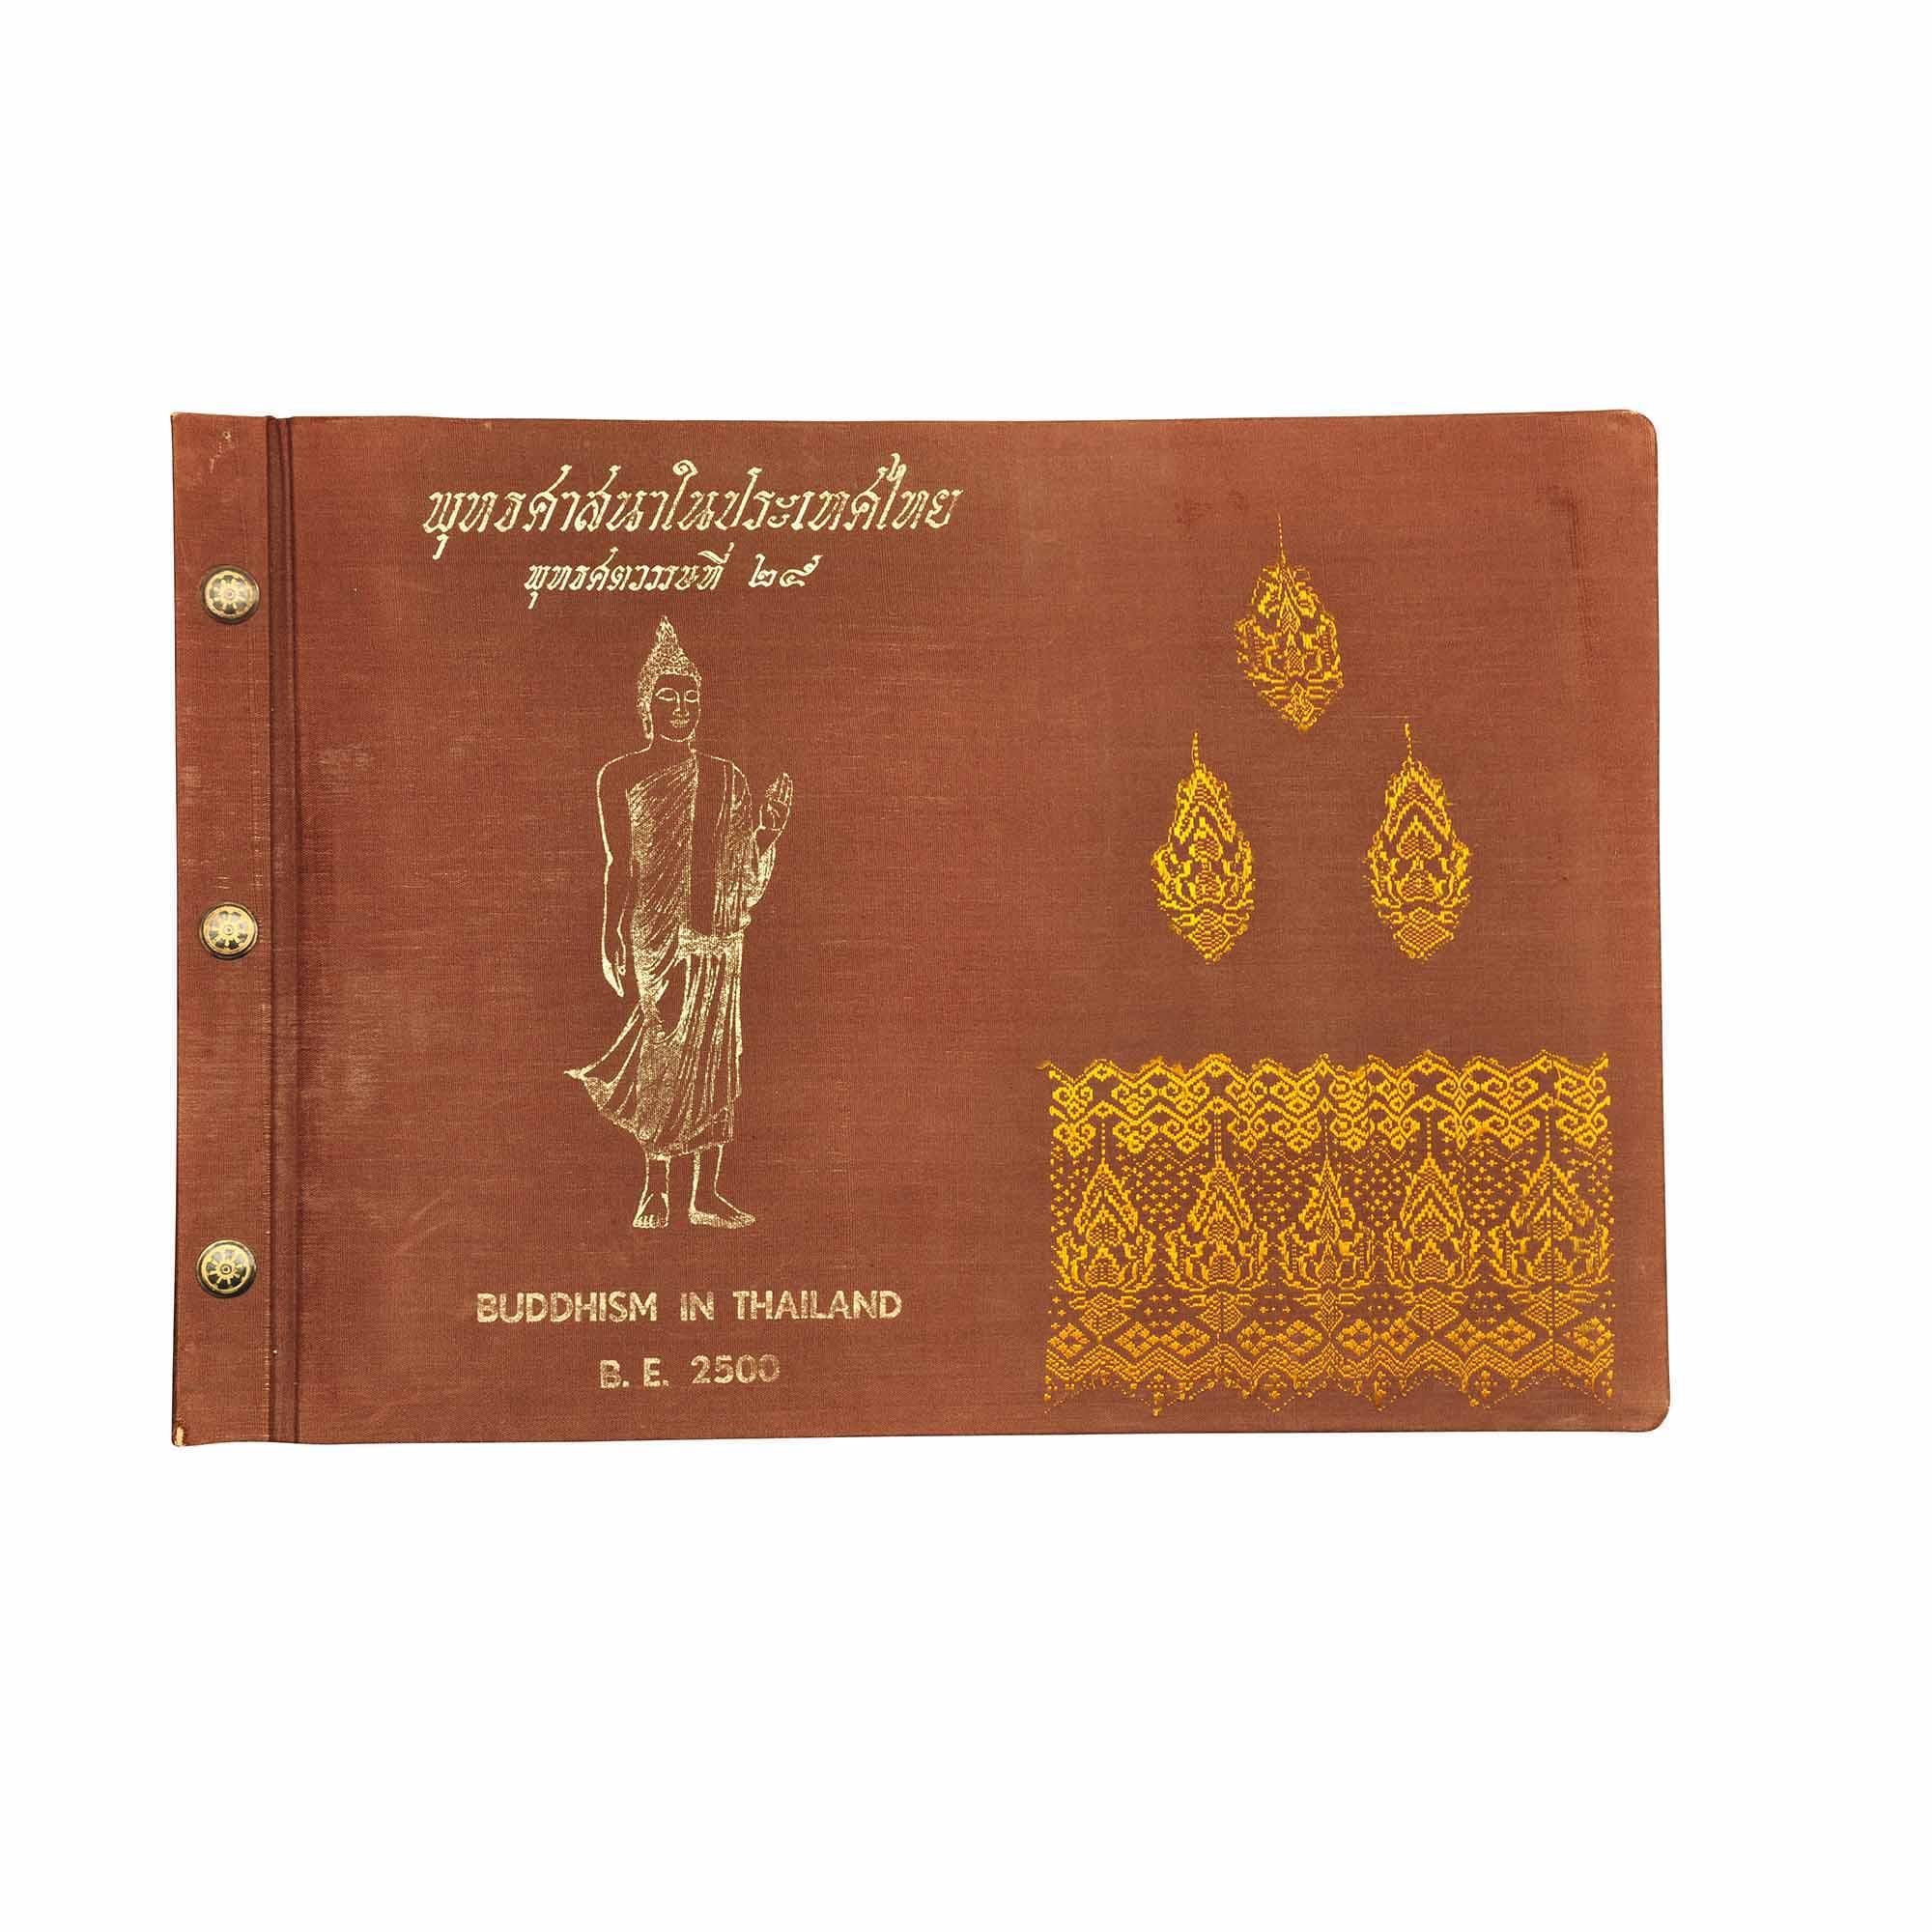 8-1317-Buddhism-Thailand-1957-1-N.jpg